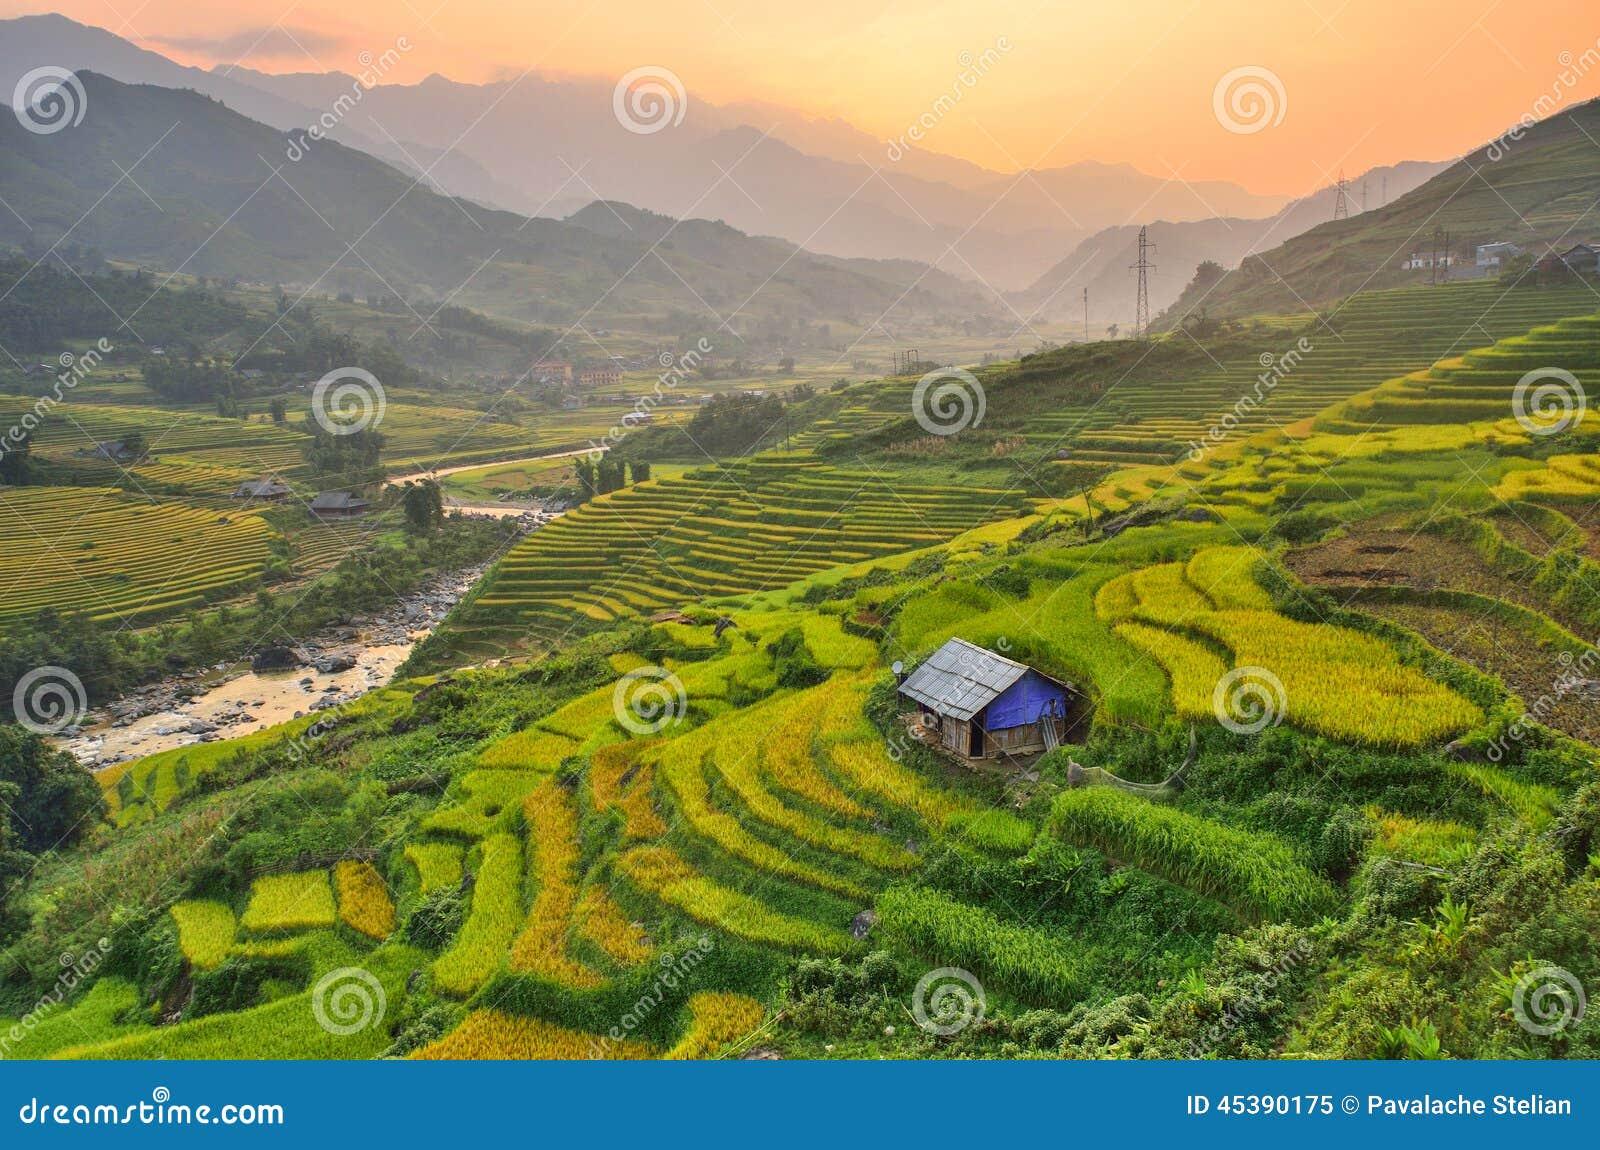 Vietnam Rice Paddy Field